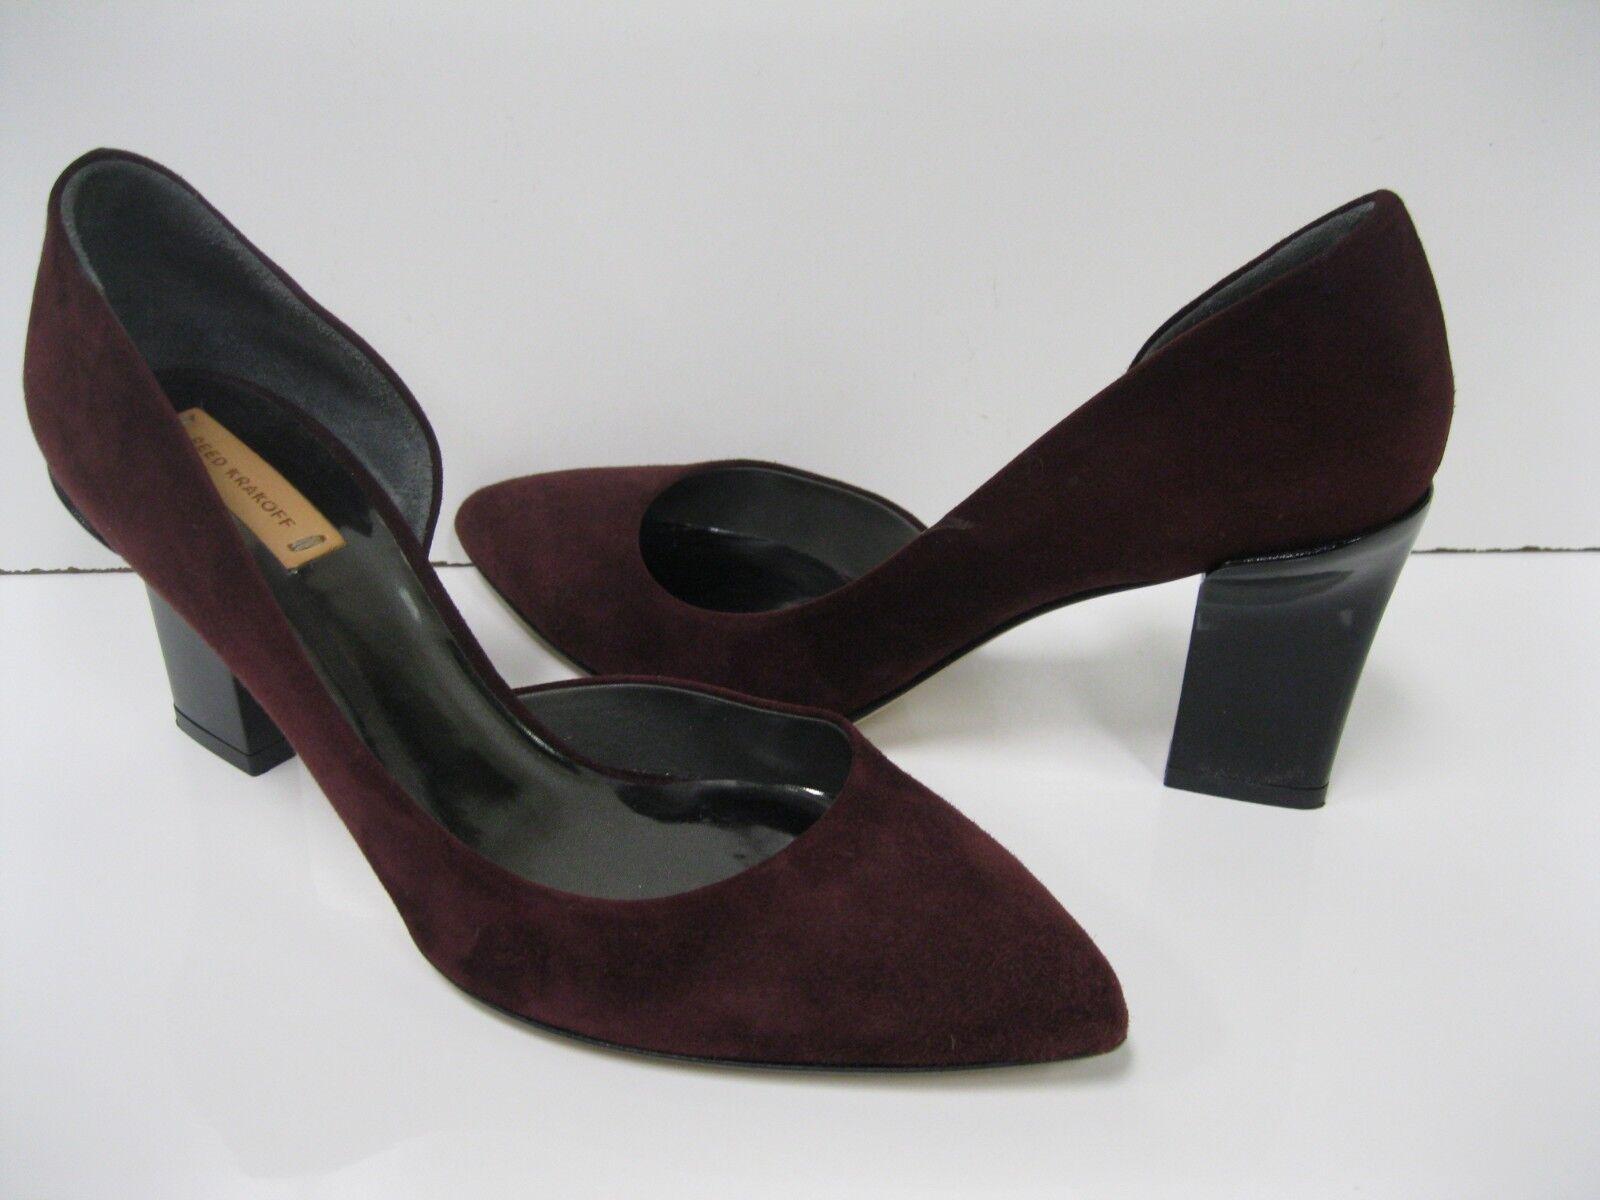 solo per te REED KRAKOFF Burgundy Suede High Heel Pumps Heels scarpe 37.5 37.5 37.5 EUC  presa di fabbrica